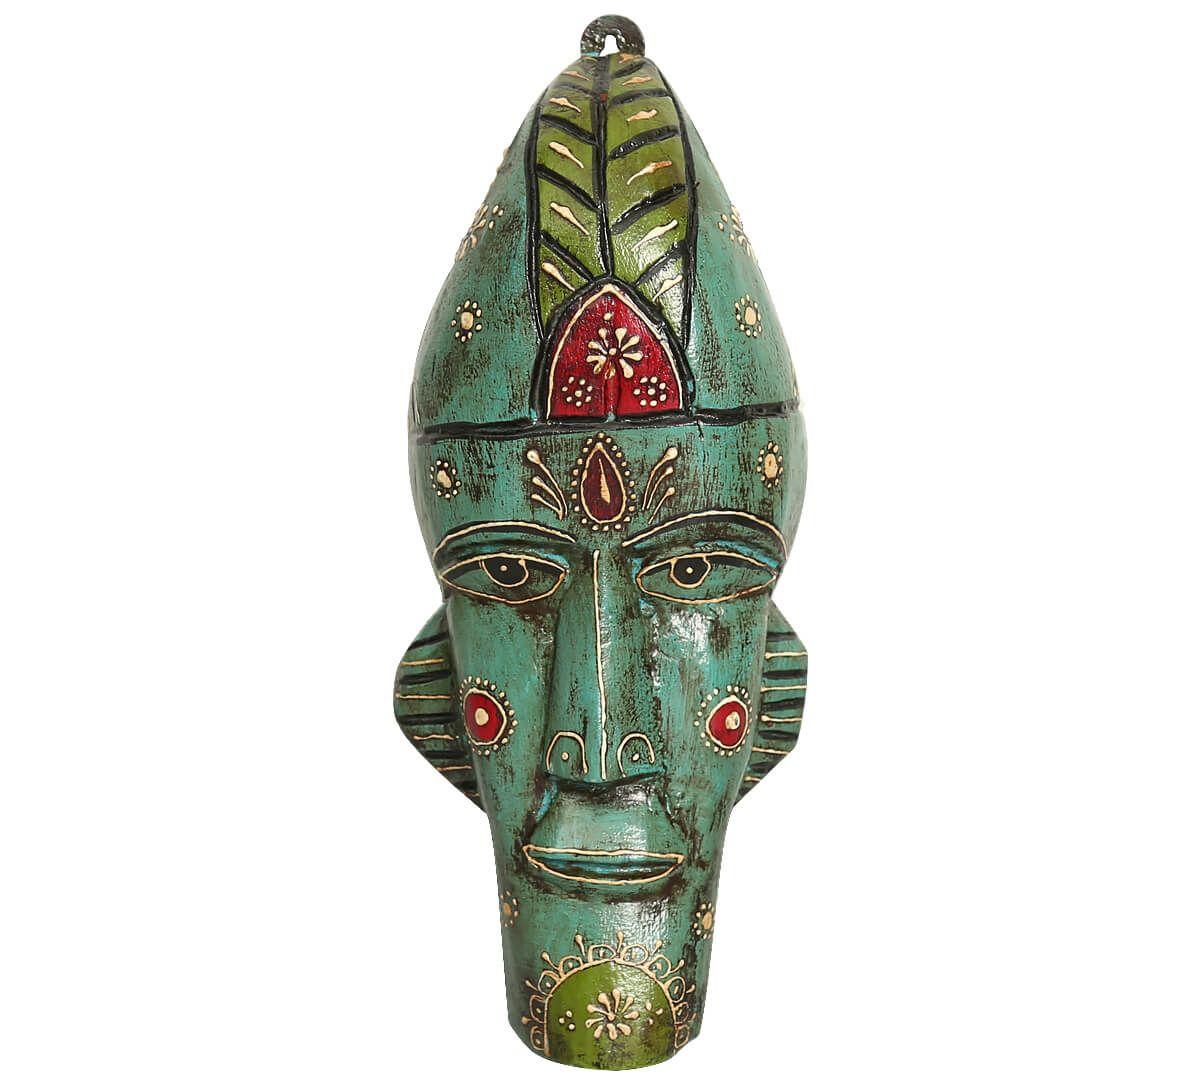 India Circus Teal Leprechaun Decorative Wooden Mask